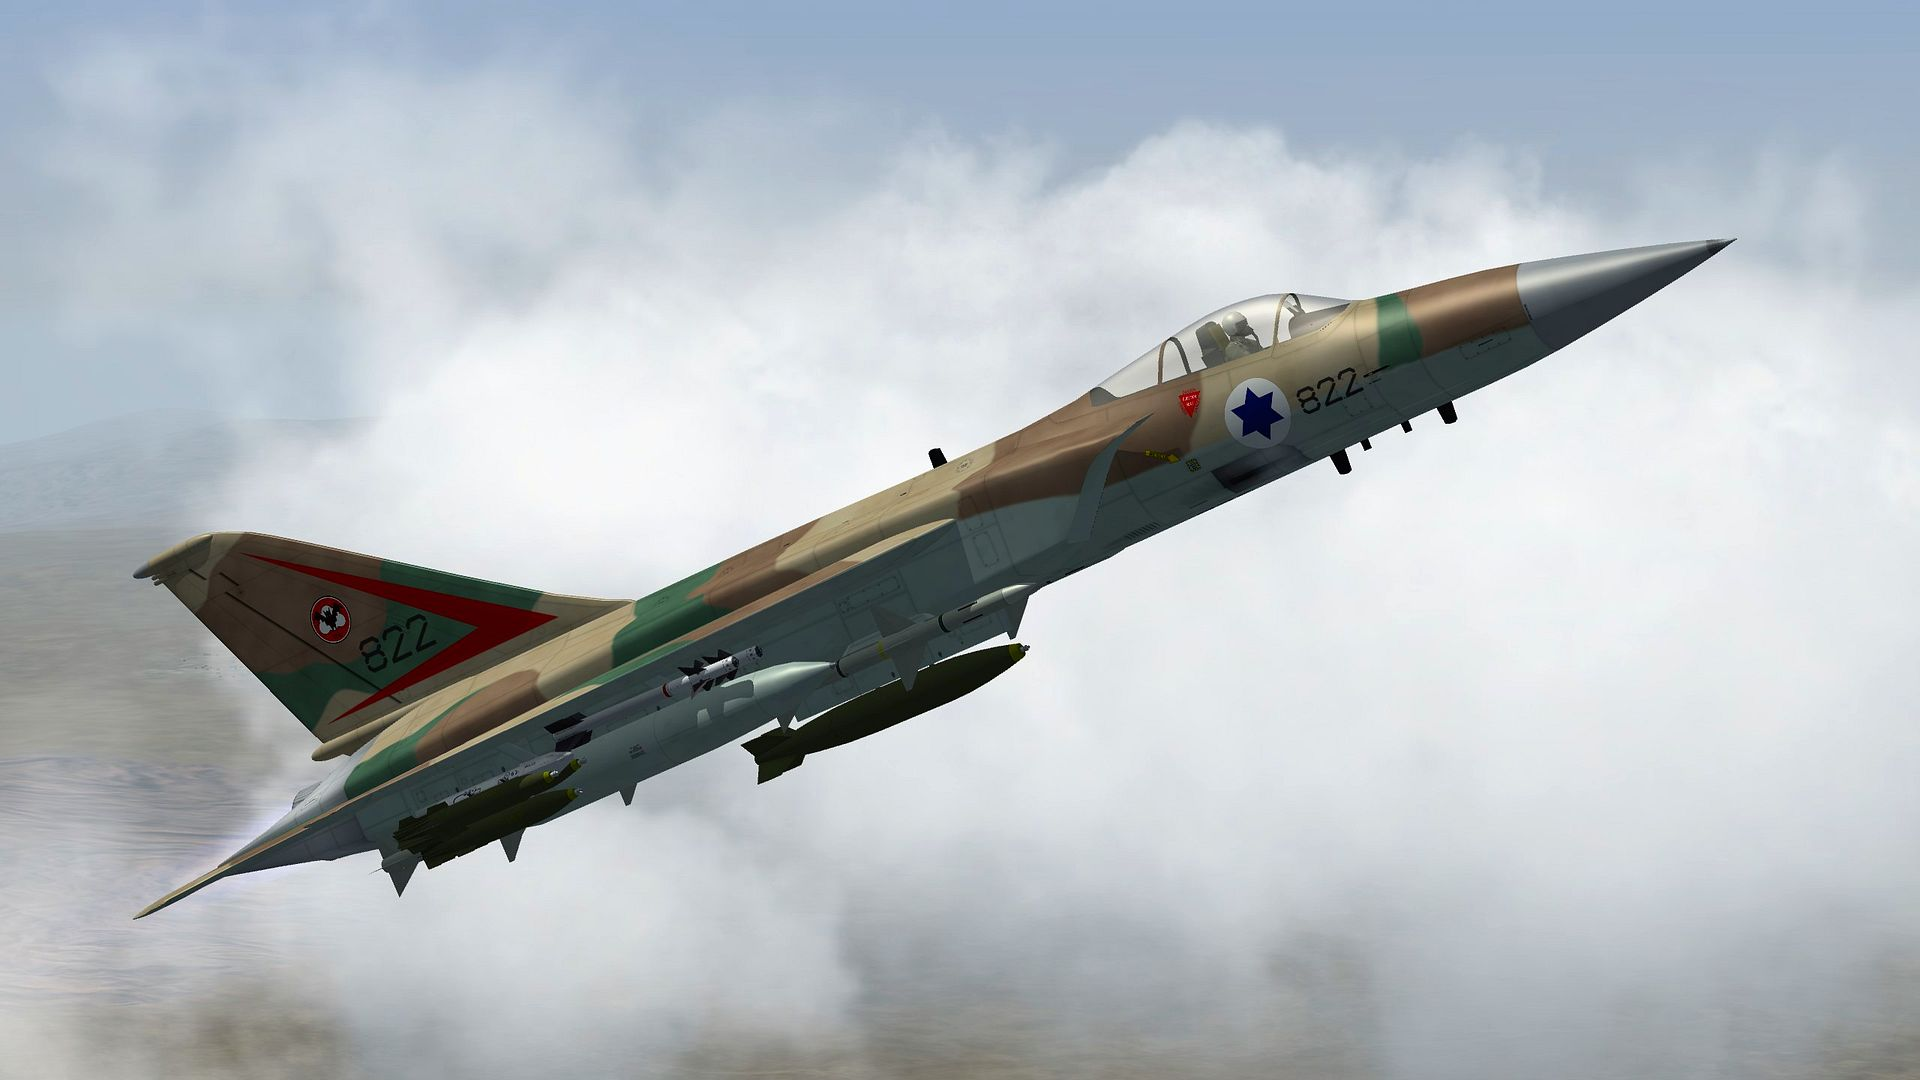 IDF%20CONDOR.05_zpsig3laooe.jpg